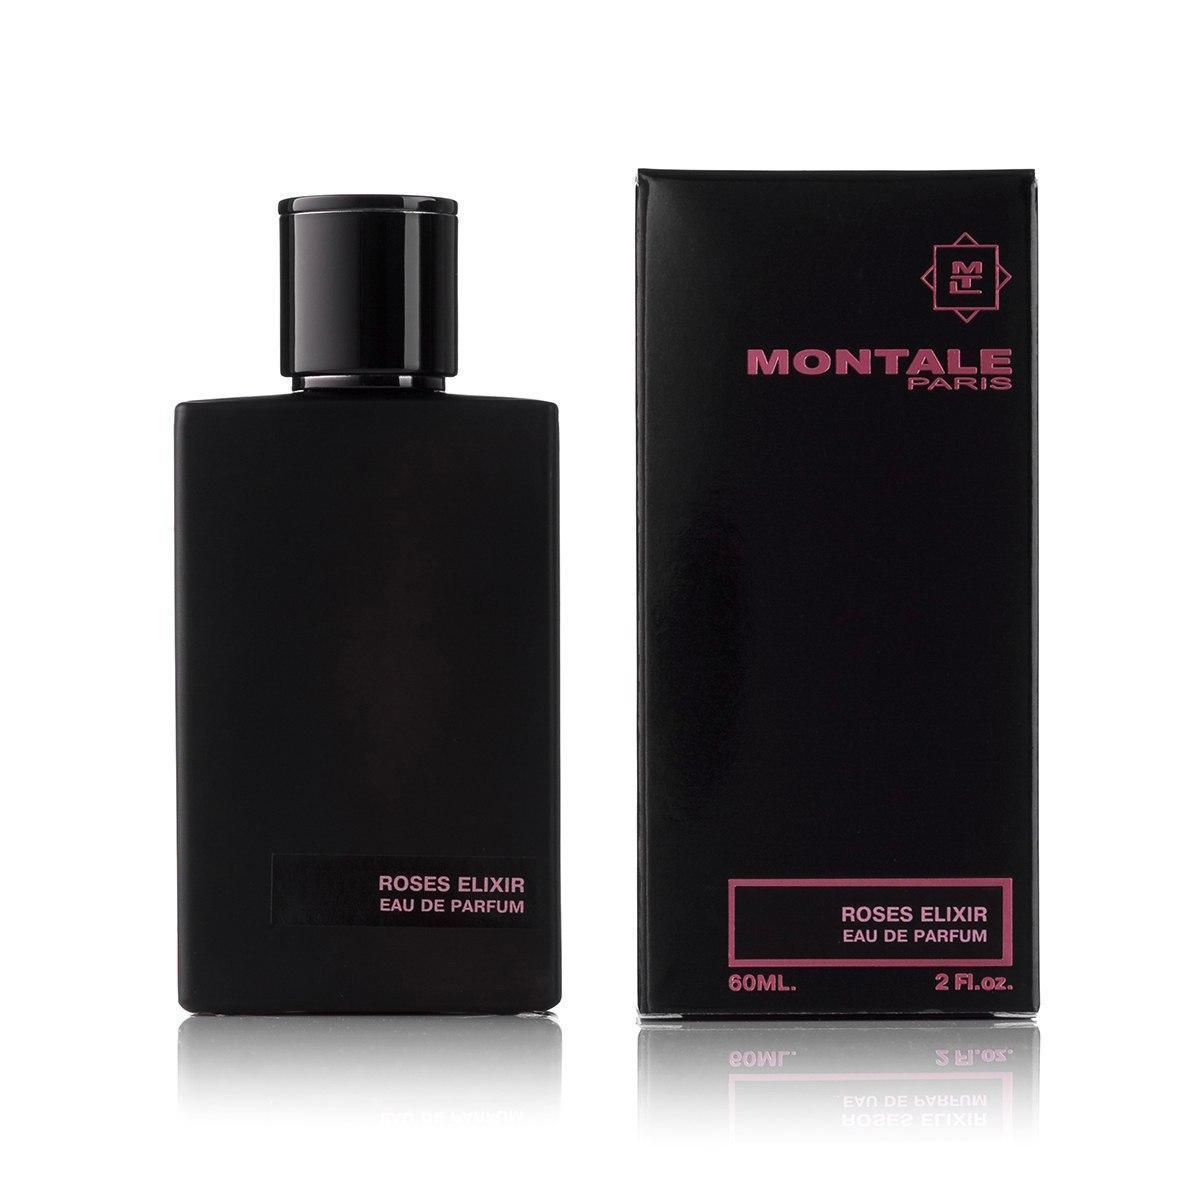 Женский мини парфюм Montale Roses Elixir женский - 60 мл (M-19)